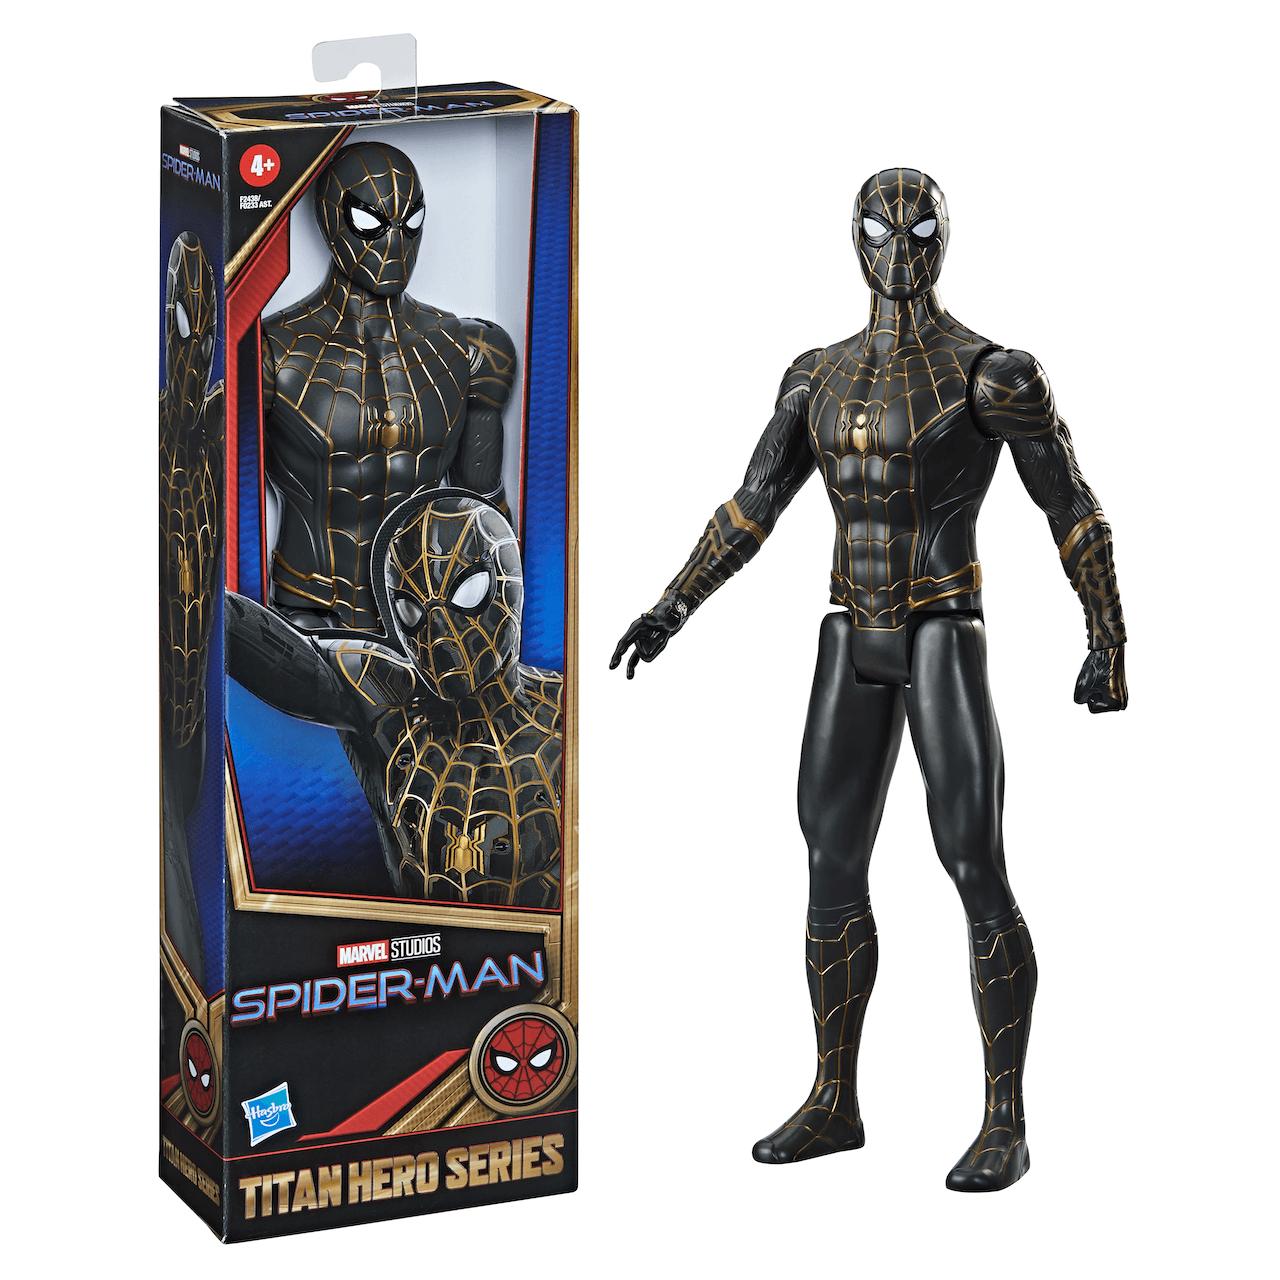 Marvel Titan Hero Series Spider-Man Black and Gold Suit